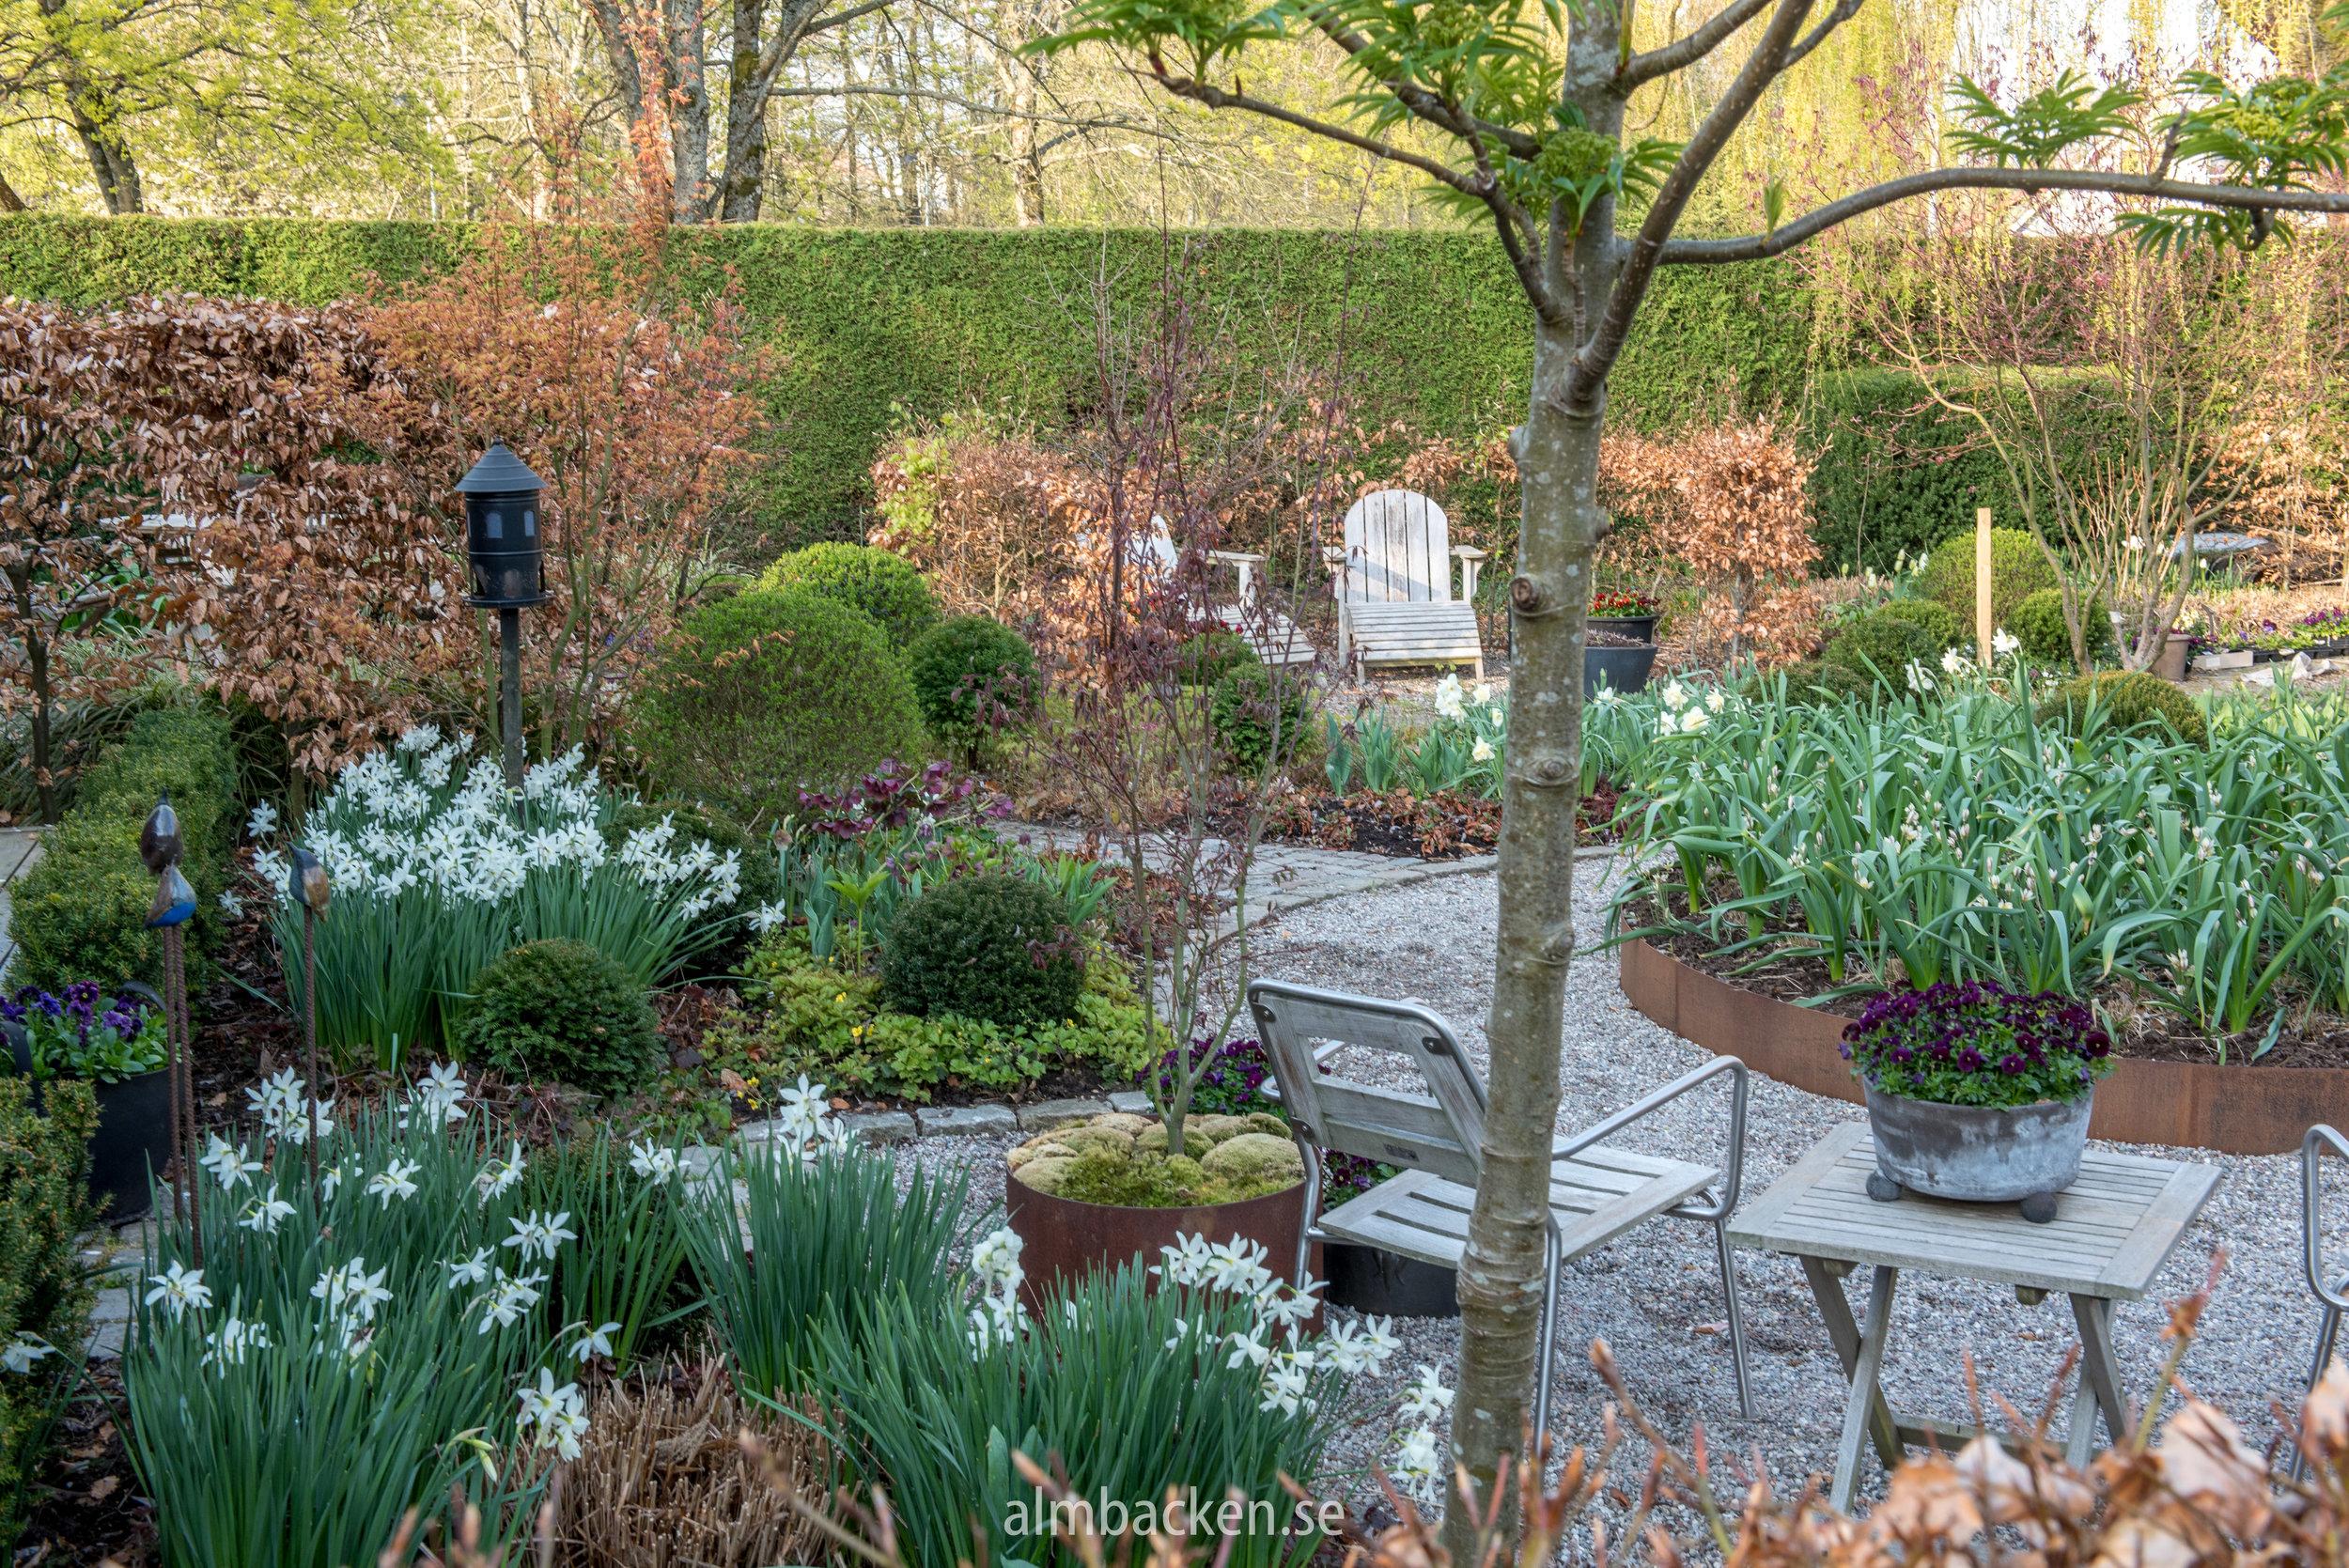 Narcissus-thalia-almbacken-tradgardsdesign-corten.jpg